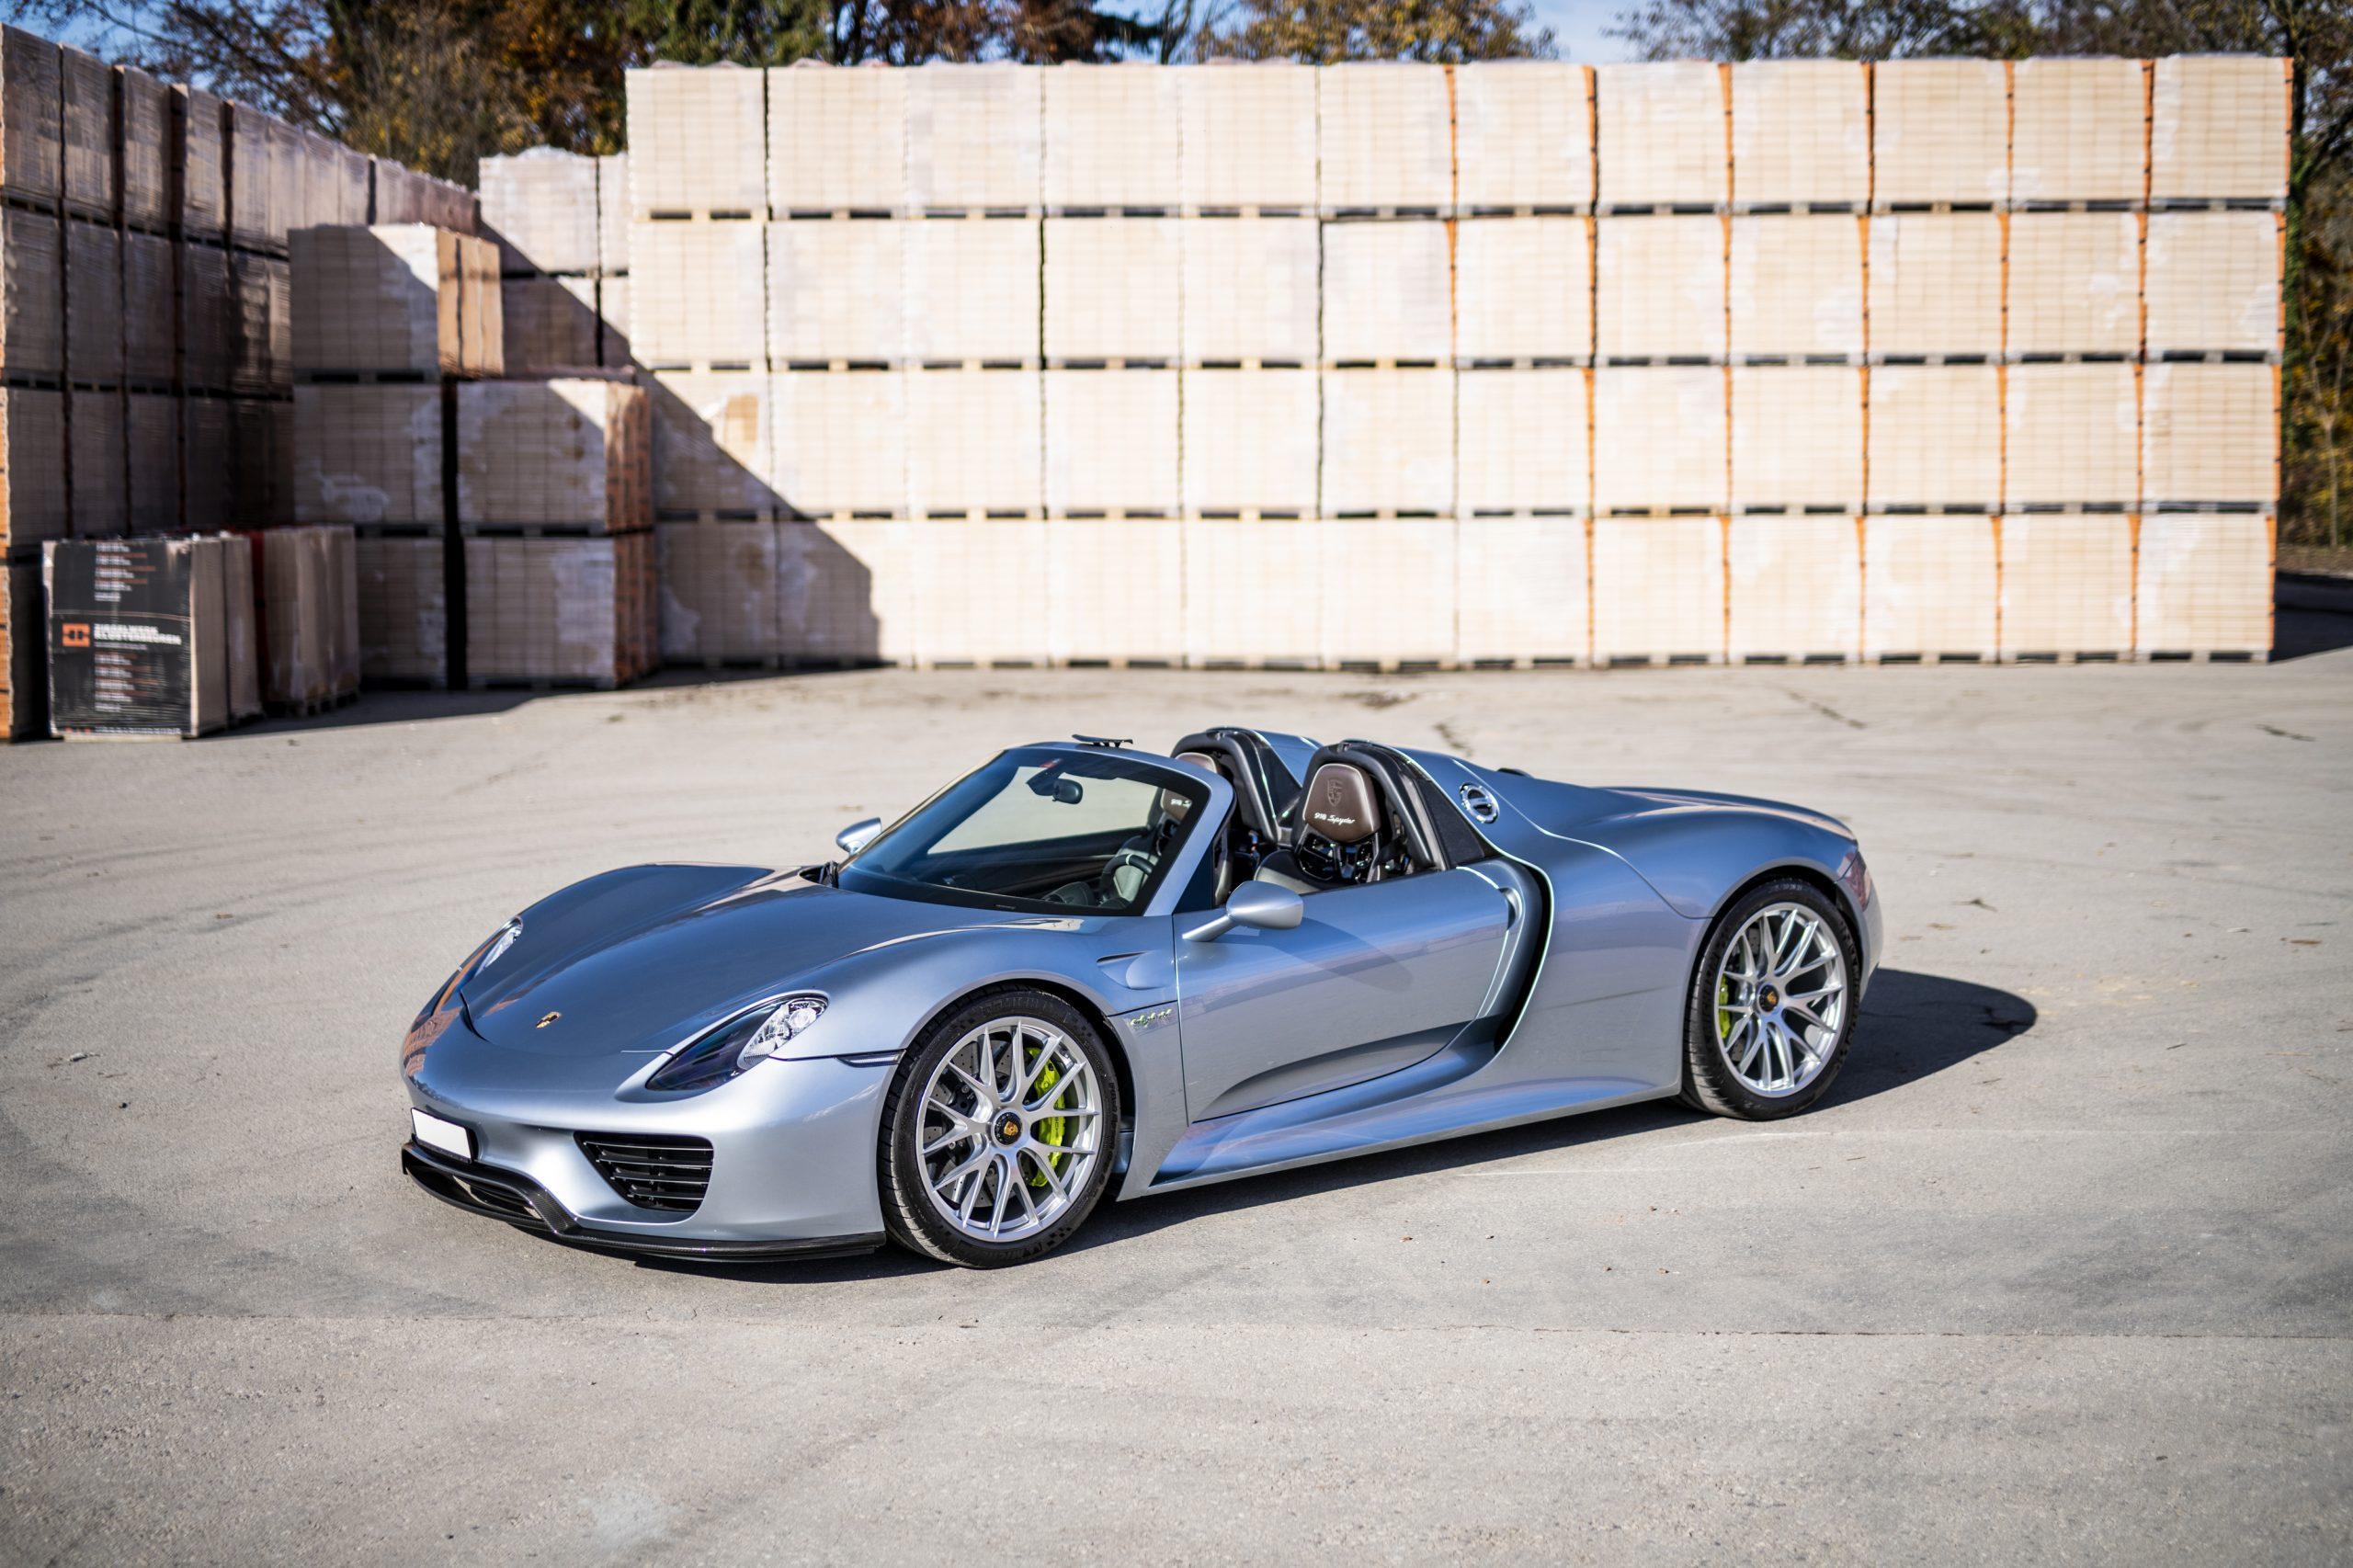 2014-Porsche-918-Spyder (2)